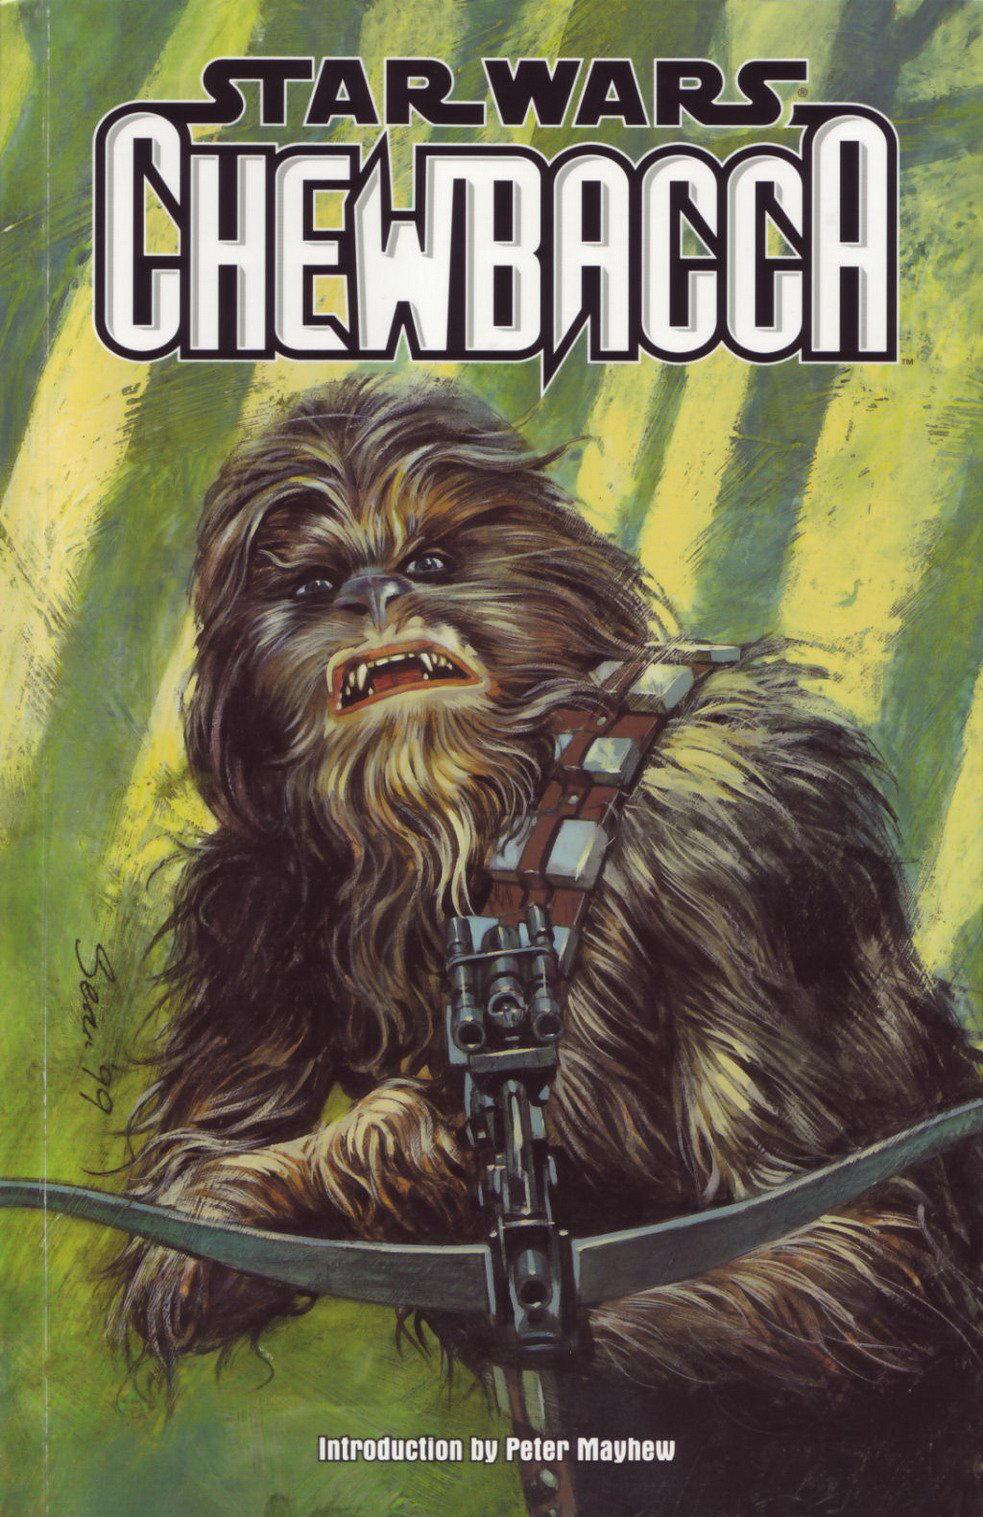 Star Wars: Chewbacca (Dark Horse)